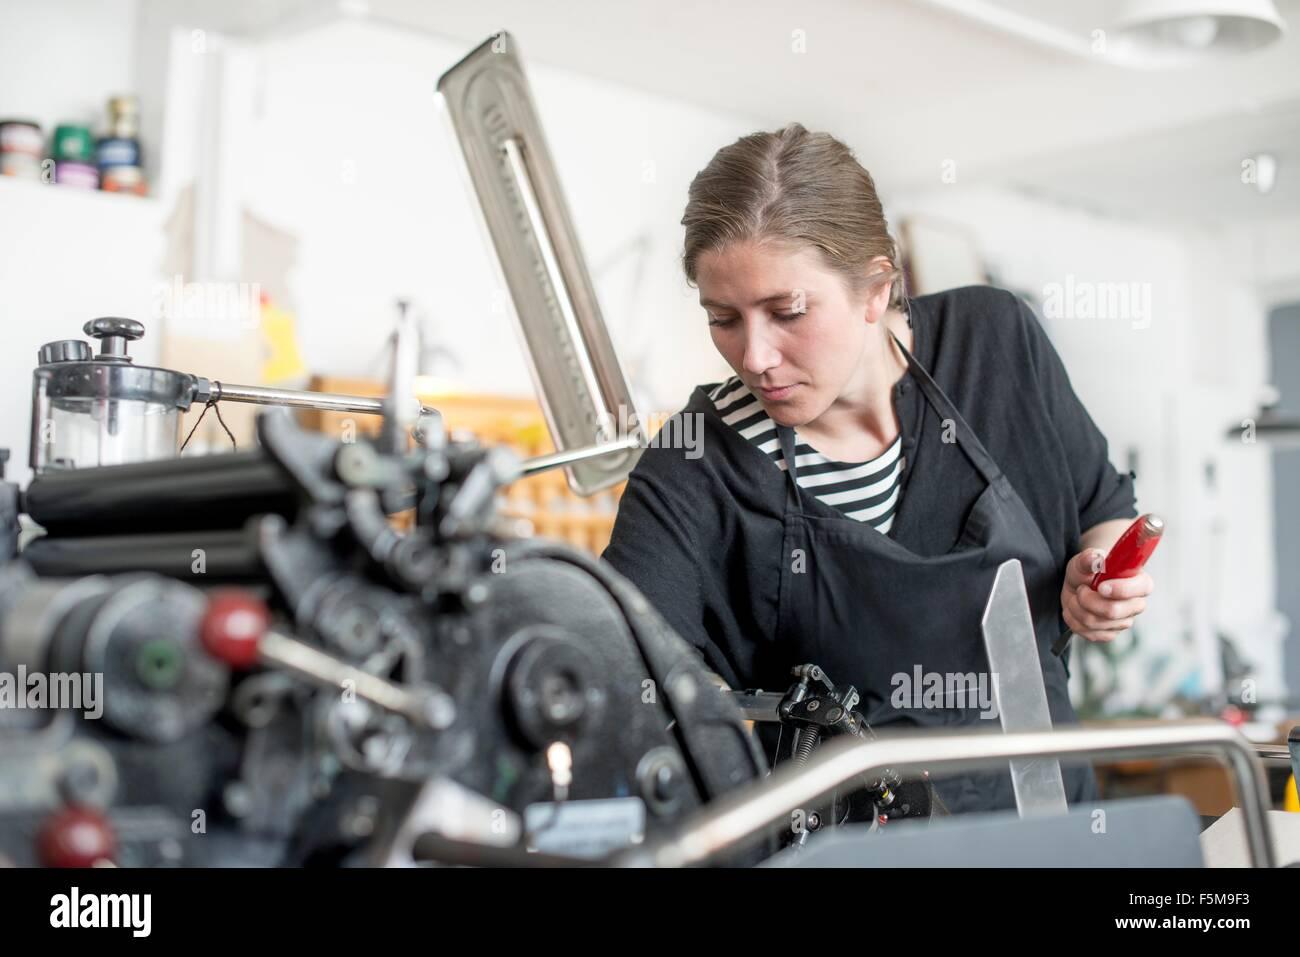 Stampante femmina prepara stampa la macchina in officina Immagini Stock